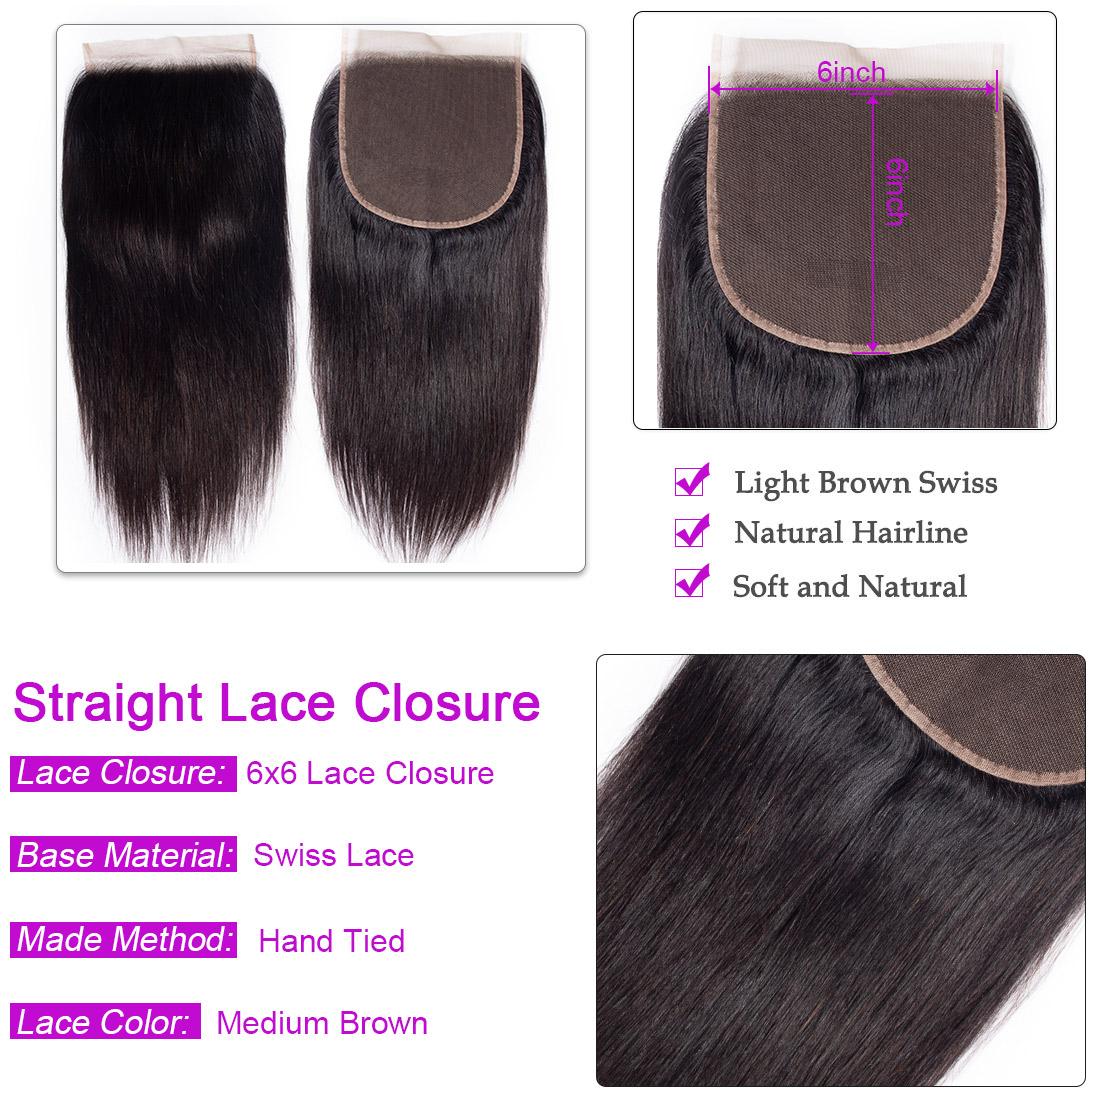 Straight 6x6 Lace Closure